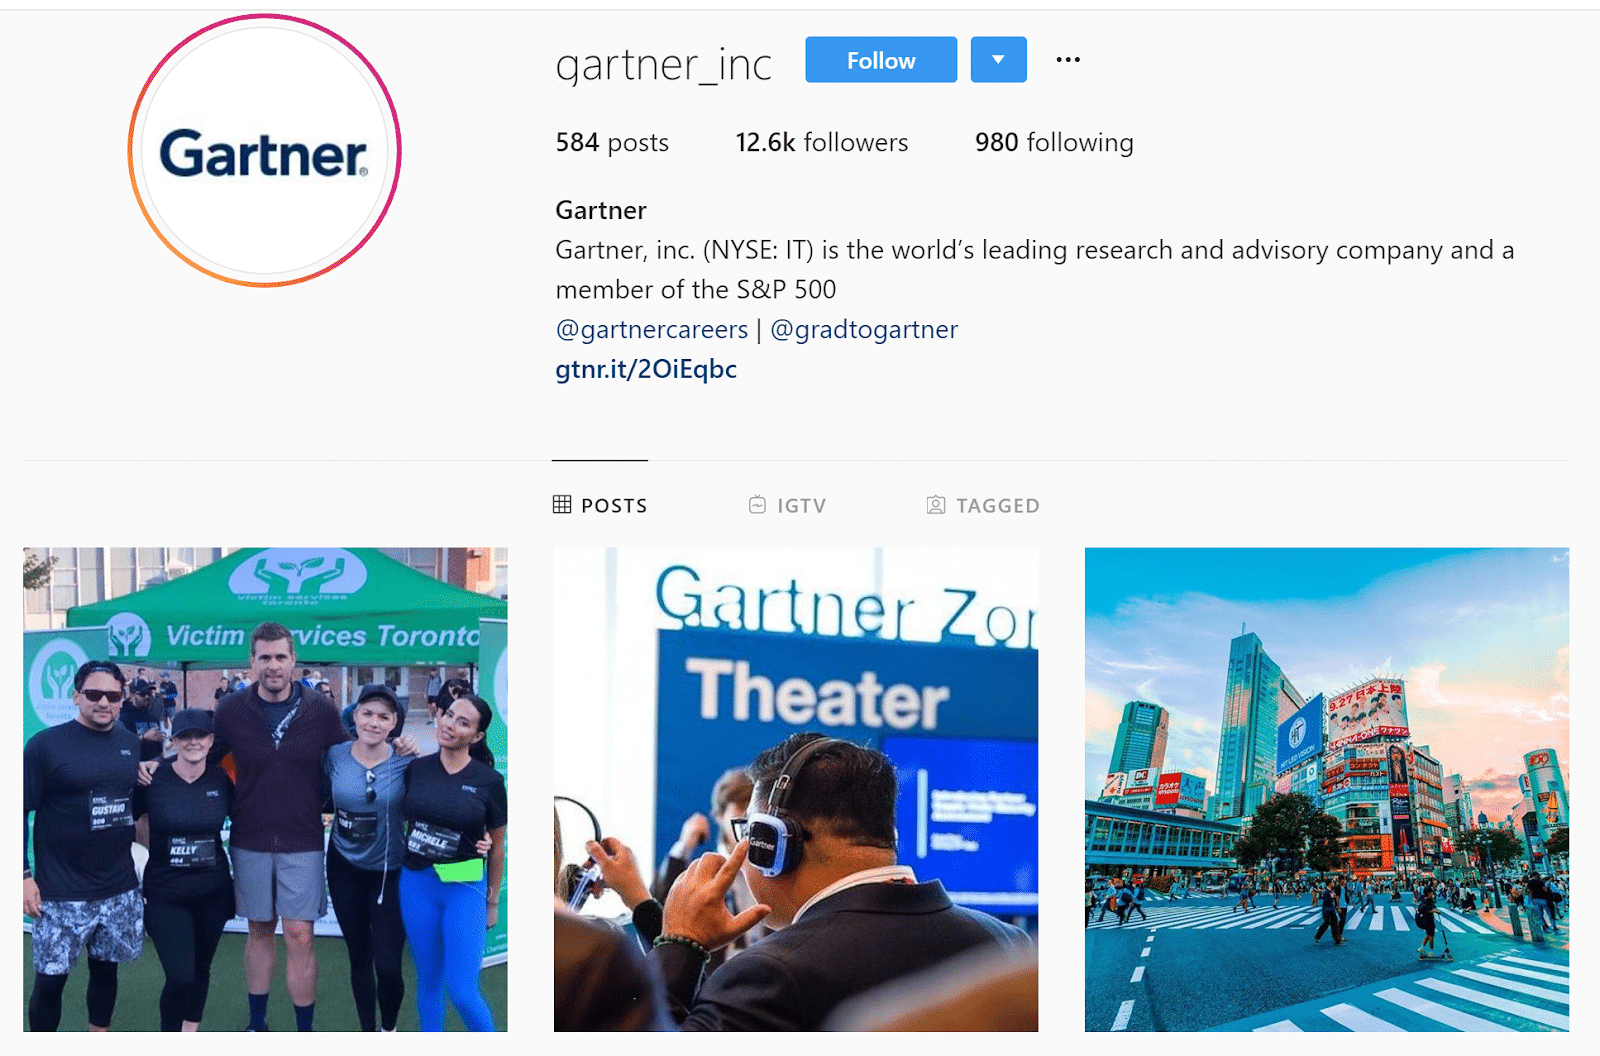 Gartner Instagram campaign